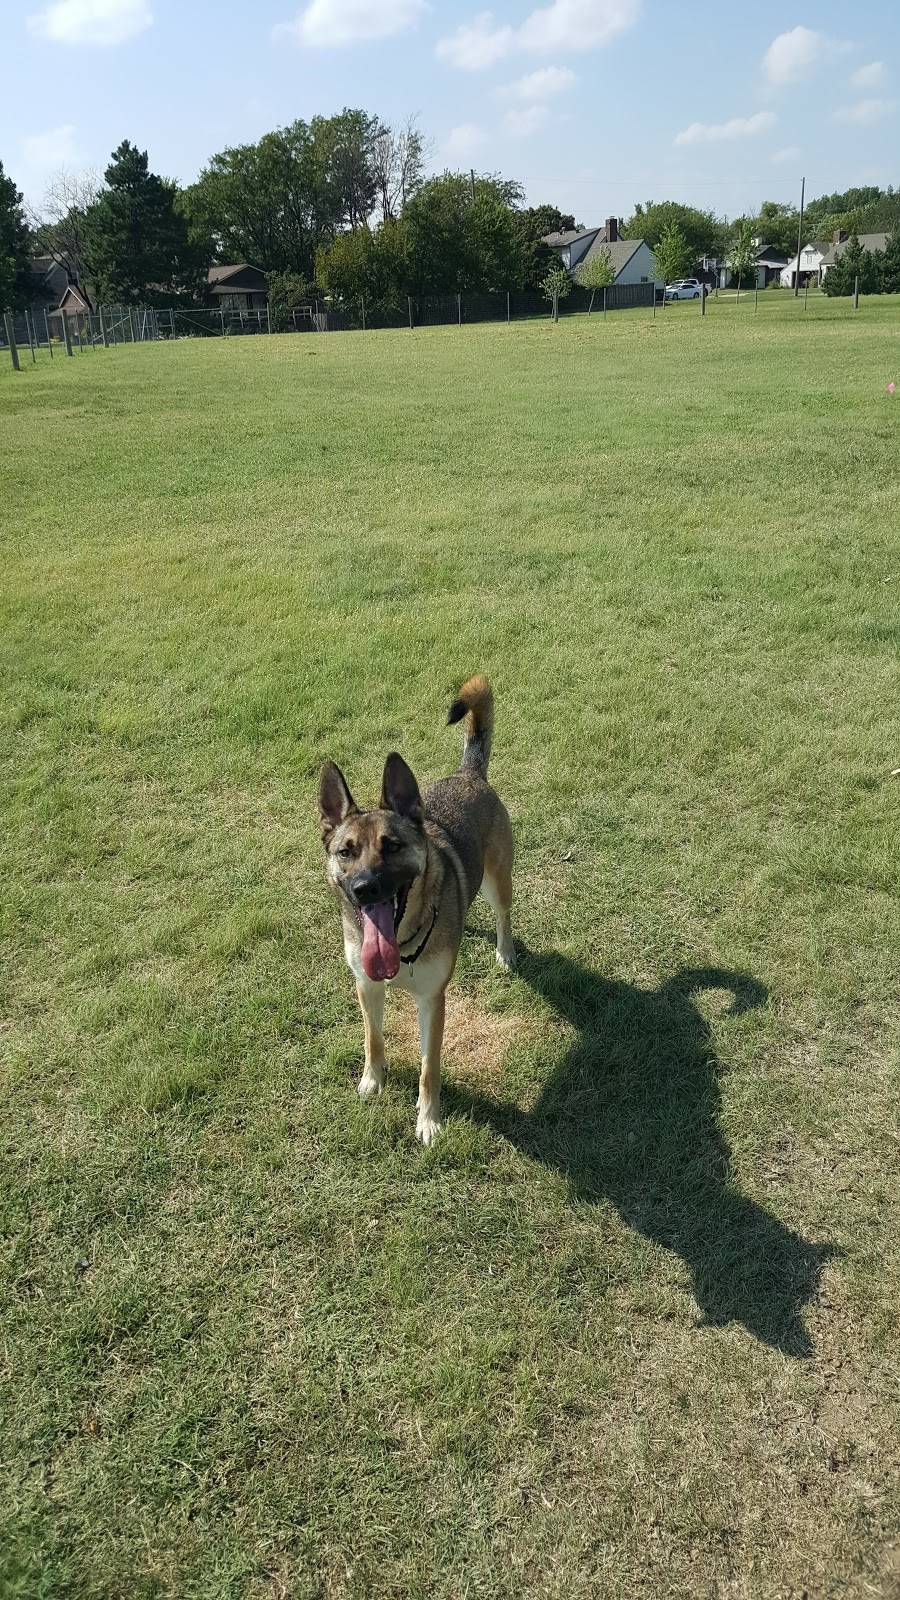 Meridian Dog Park - park  | Photo 7 of 9 | Address: 2127 N Meridian Ave, Wichita, KS 67203, USA | Phone: (316) 268-4361